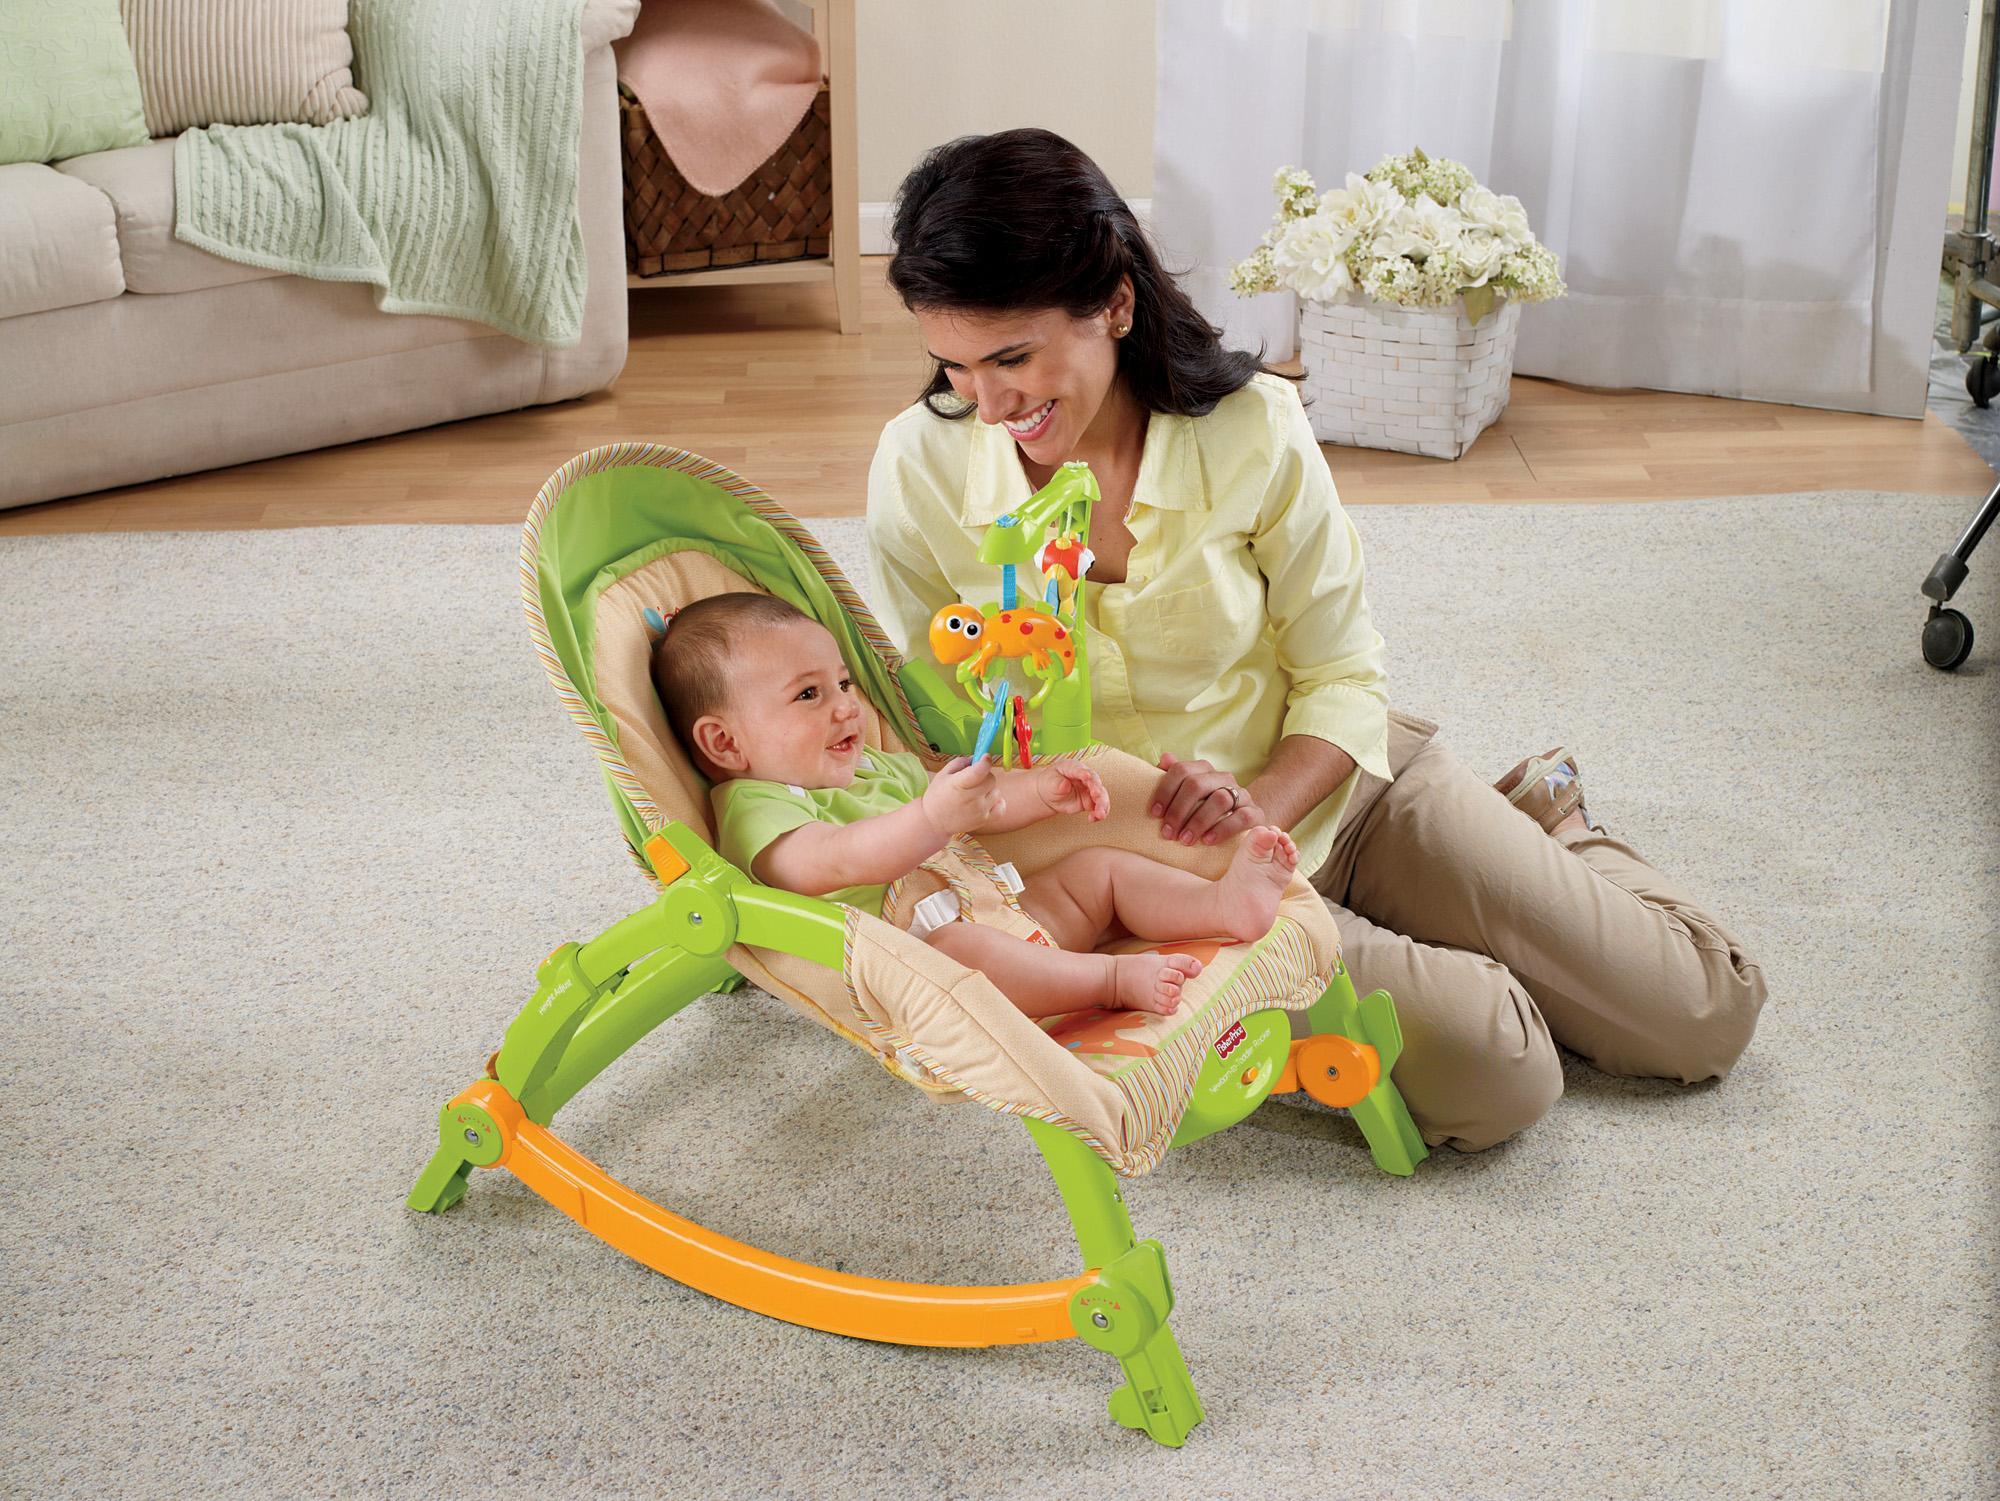 Amazon.com : Fisher-Price Newborn-to-Toddler Portable